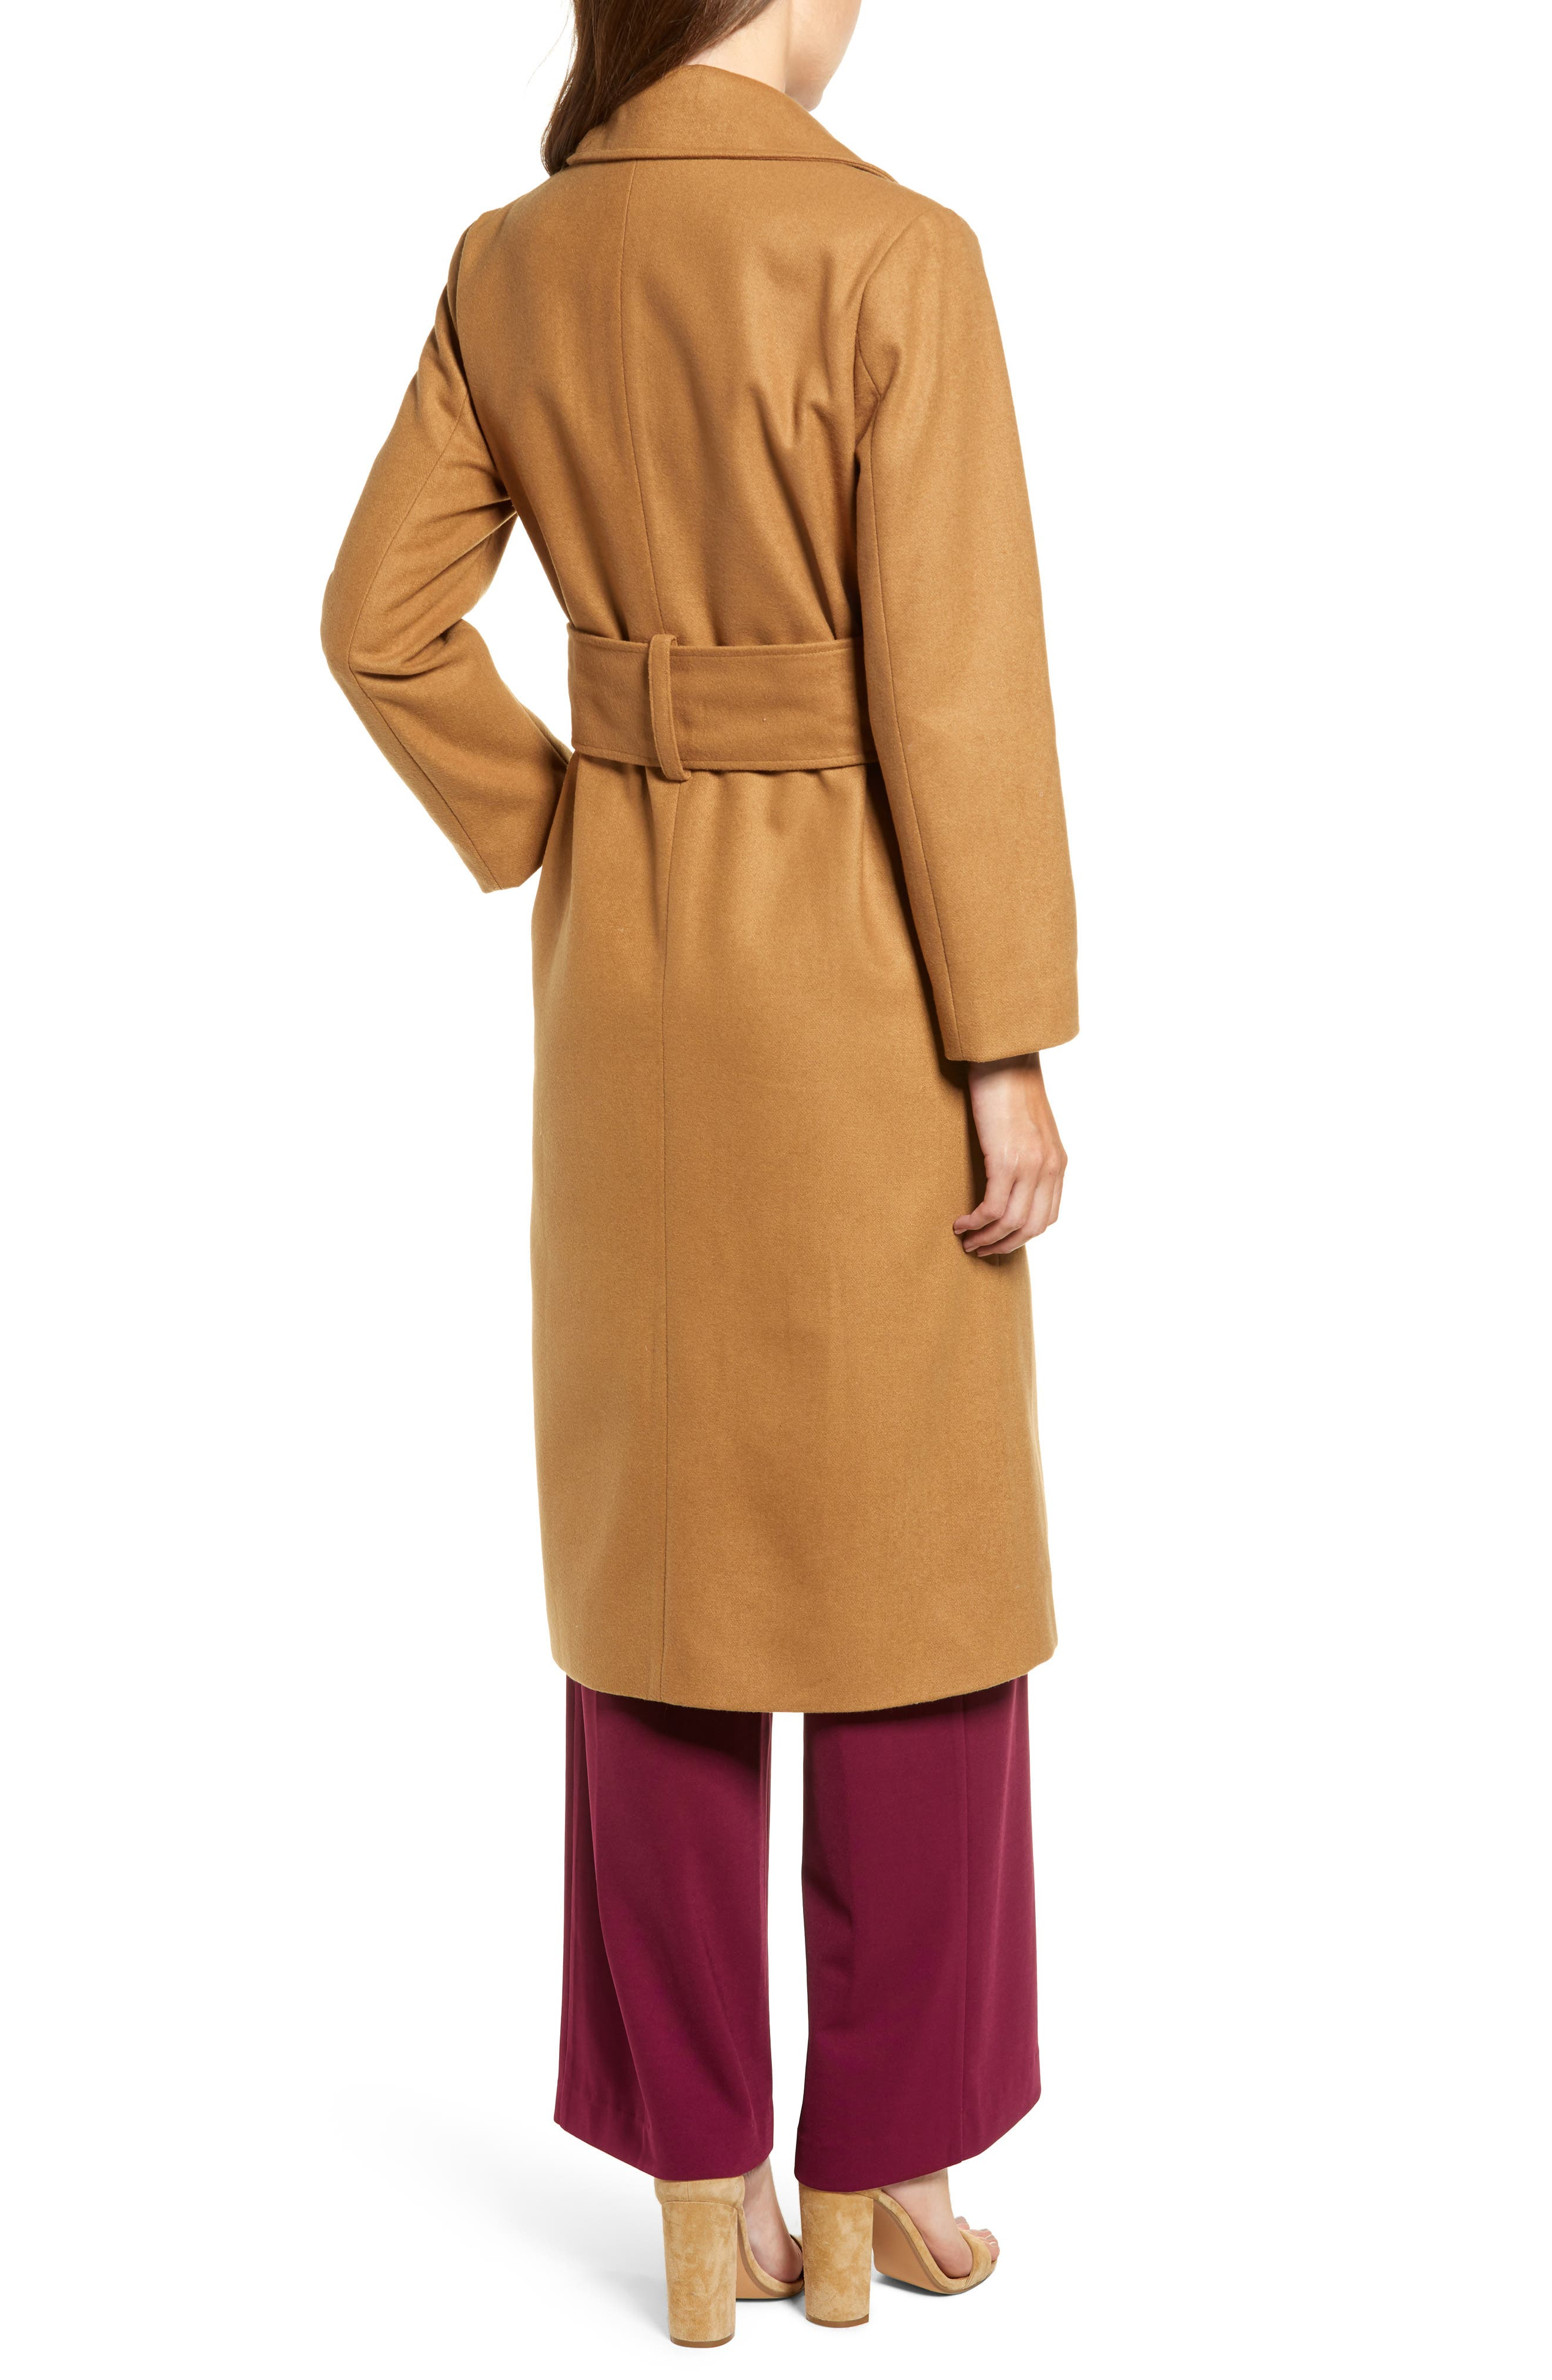 Chriselle Lim Victoria Belted Coat,                             Alternate thumbnail 3, color,                             CAMEL